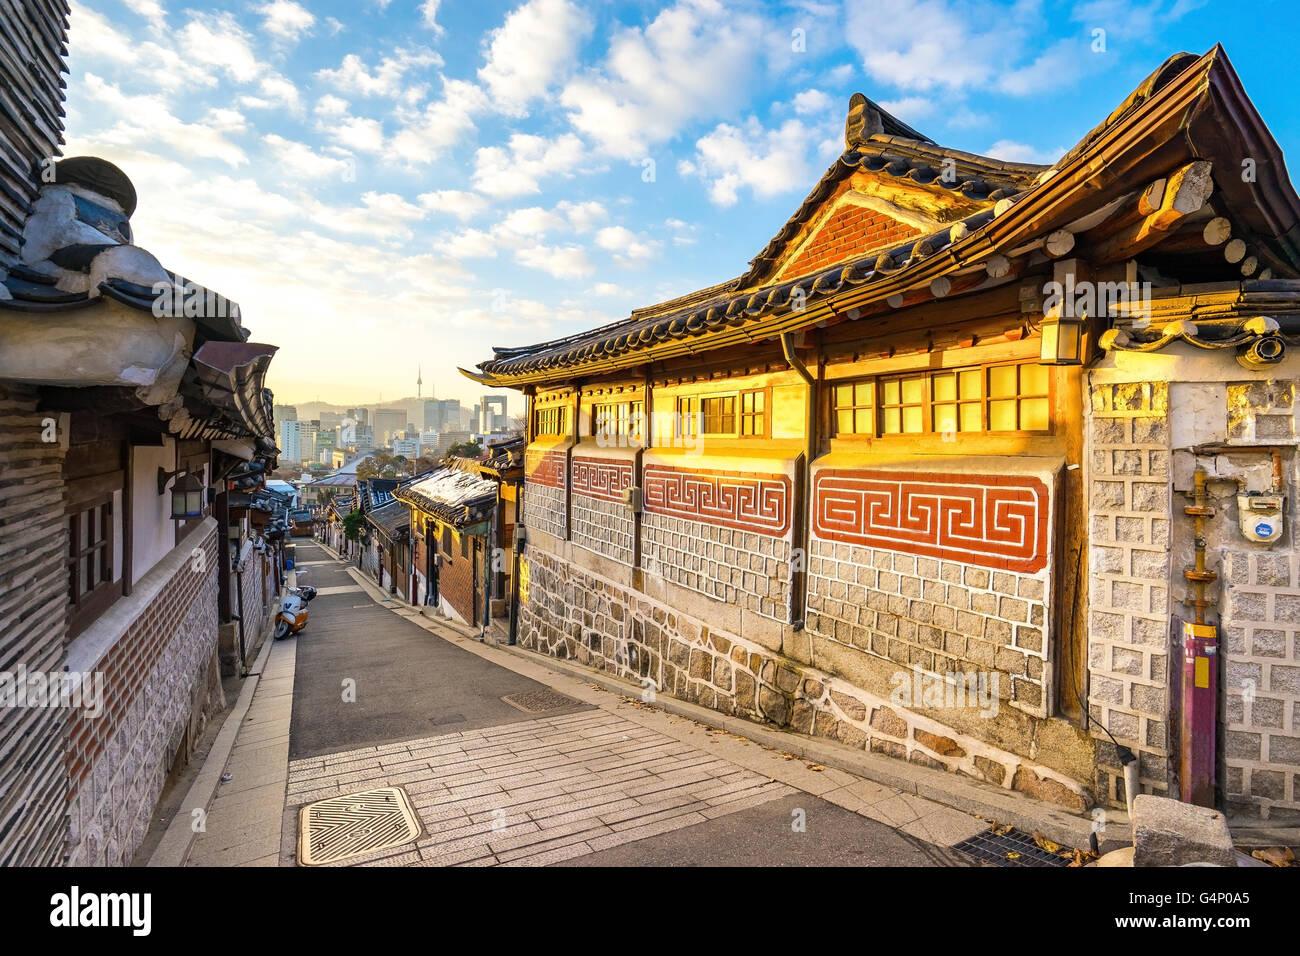 Bukchon das alte Dorf in Seoul, Südkorea. Stockbild